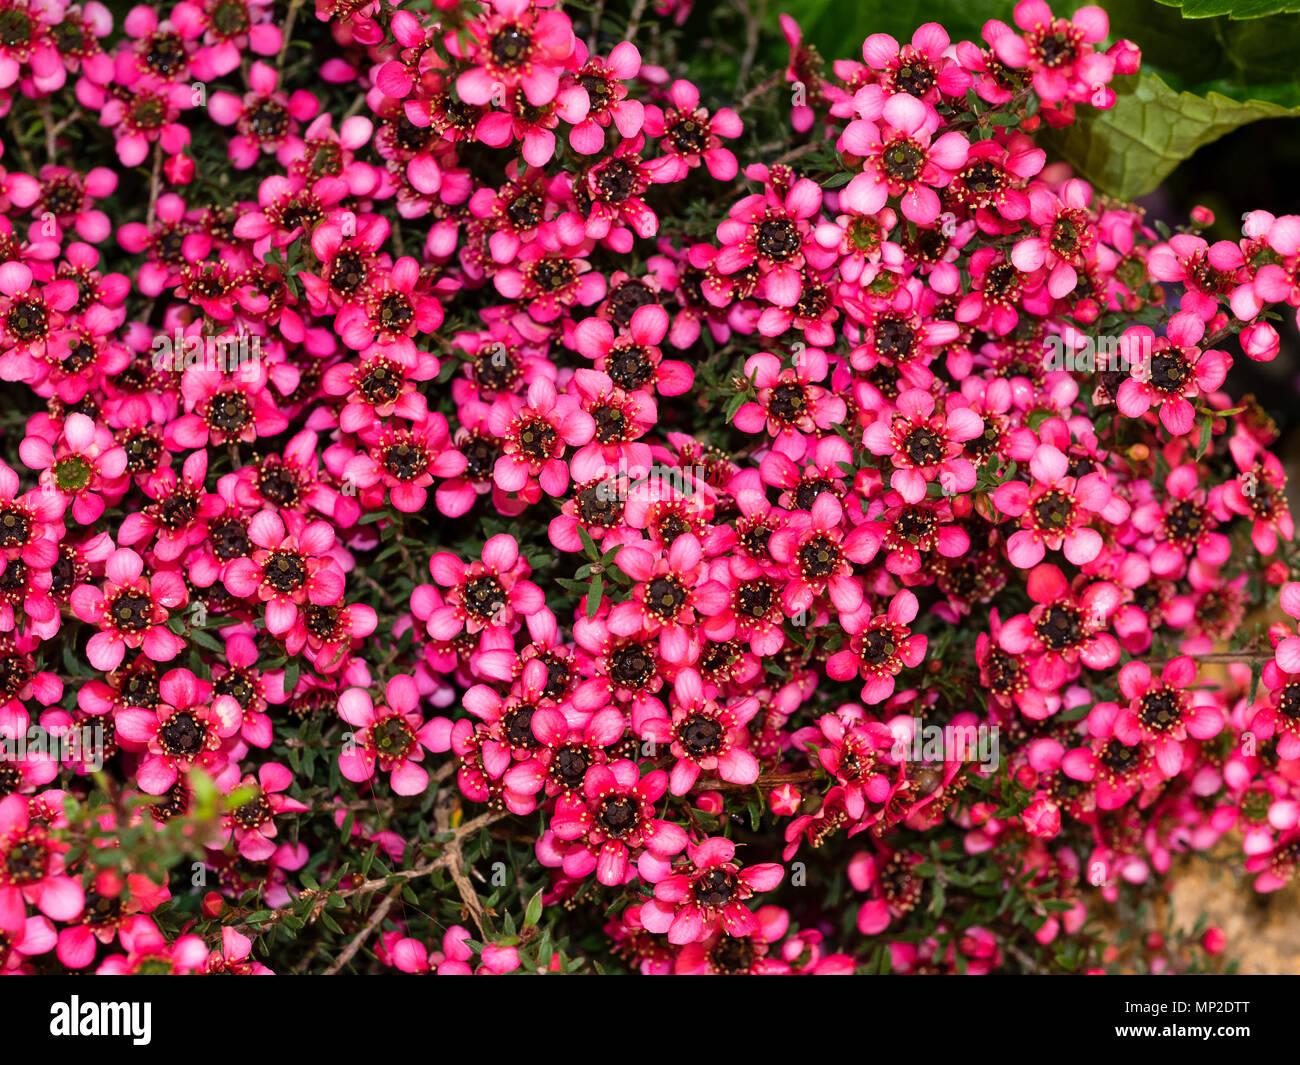 Red flowered form of the New Zealand Manuka or tea tree, Leptospermum scoparium 'Kiwi, hardy in milder climates - Stock Image